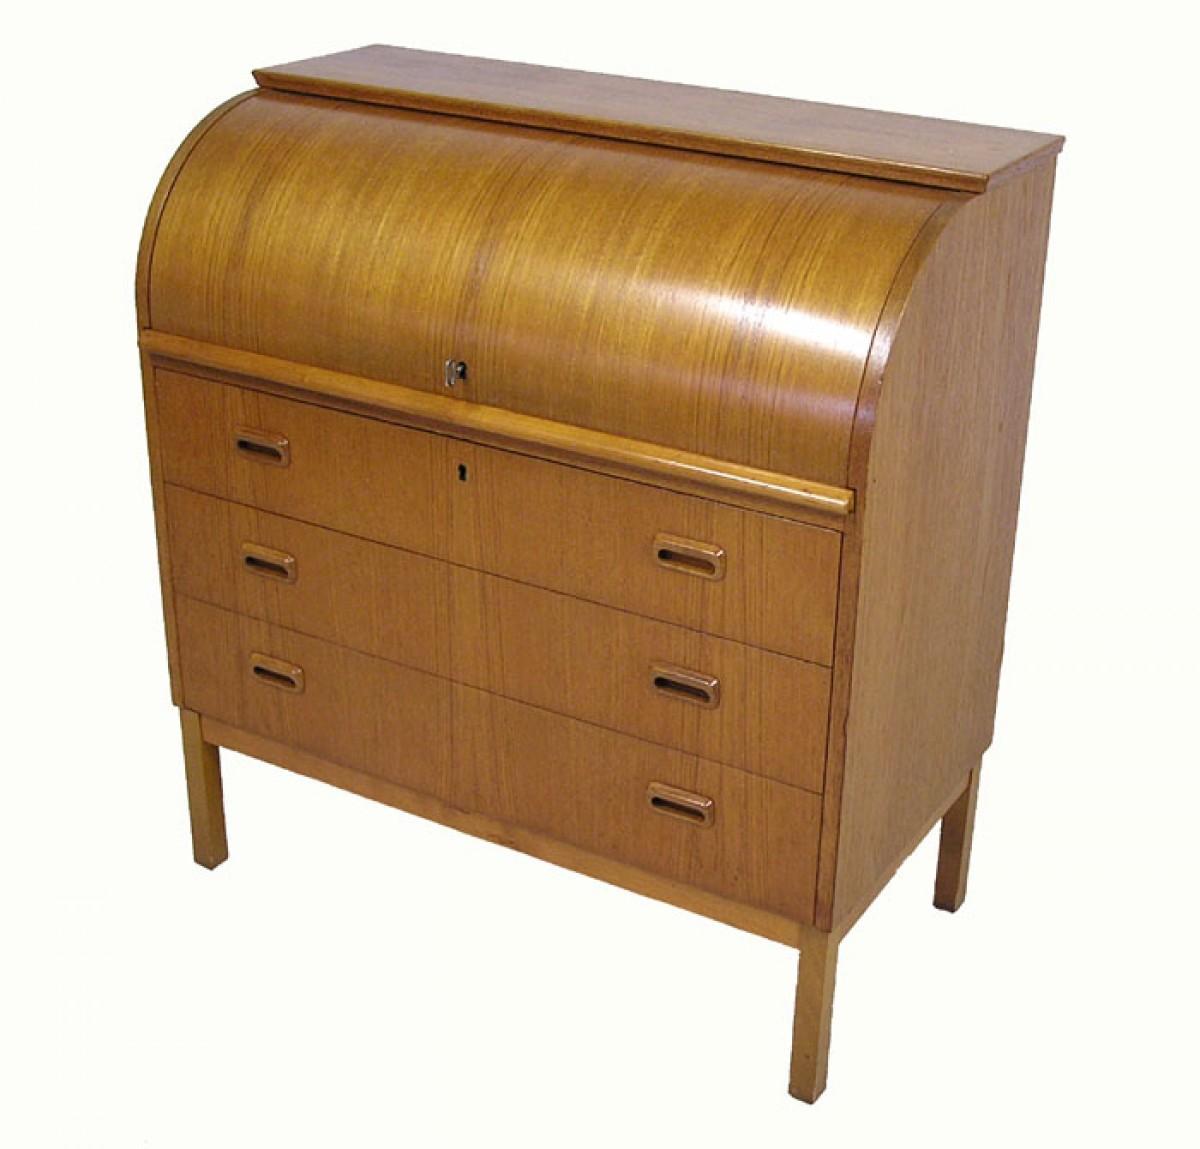 1960 70s Teak Roll Top Writing Desk Hoopers Modern